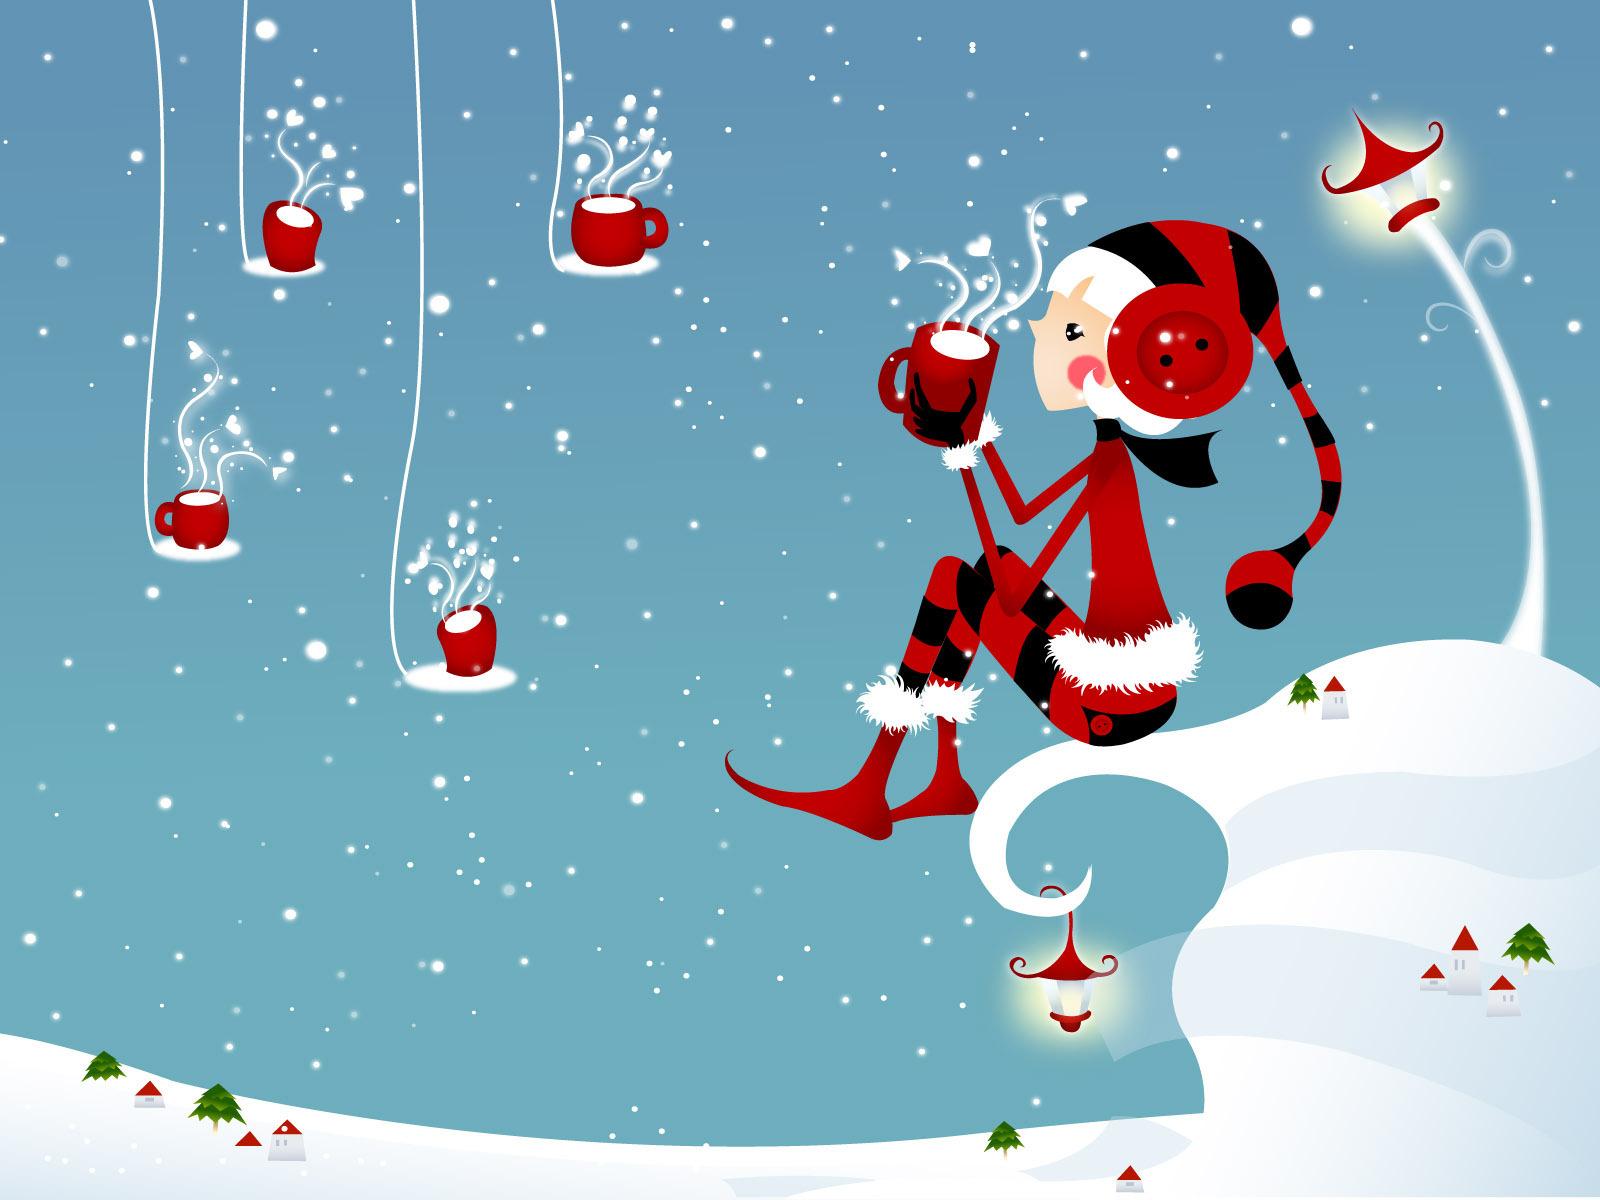 Free Animated Christmas Wallpaper for Desktop (7)